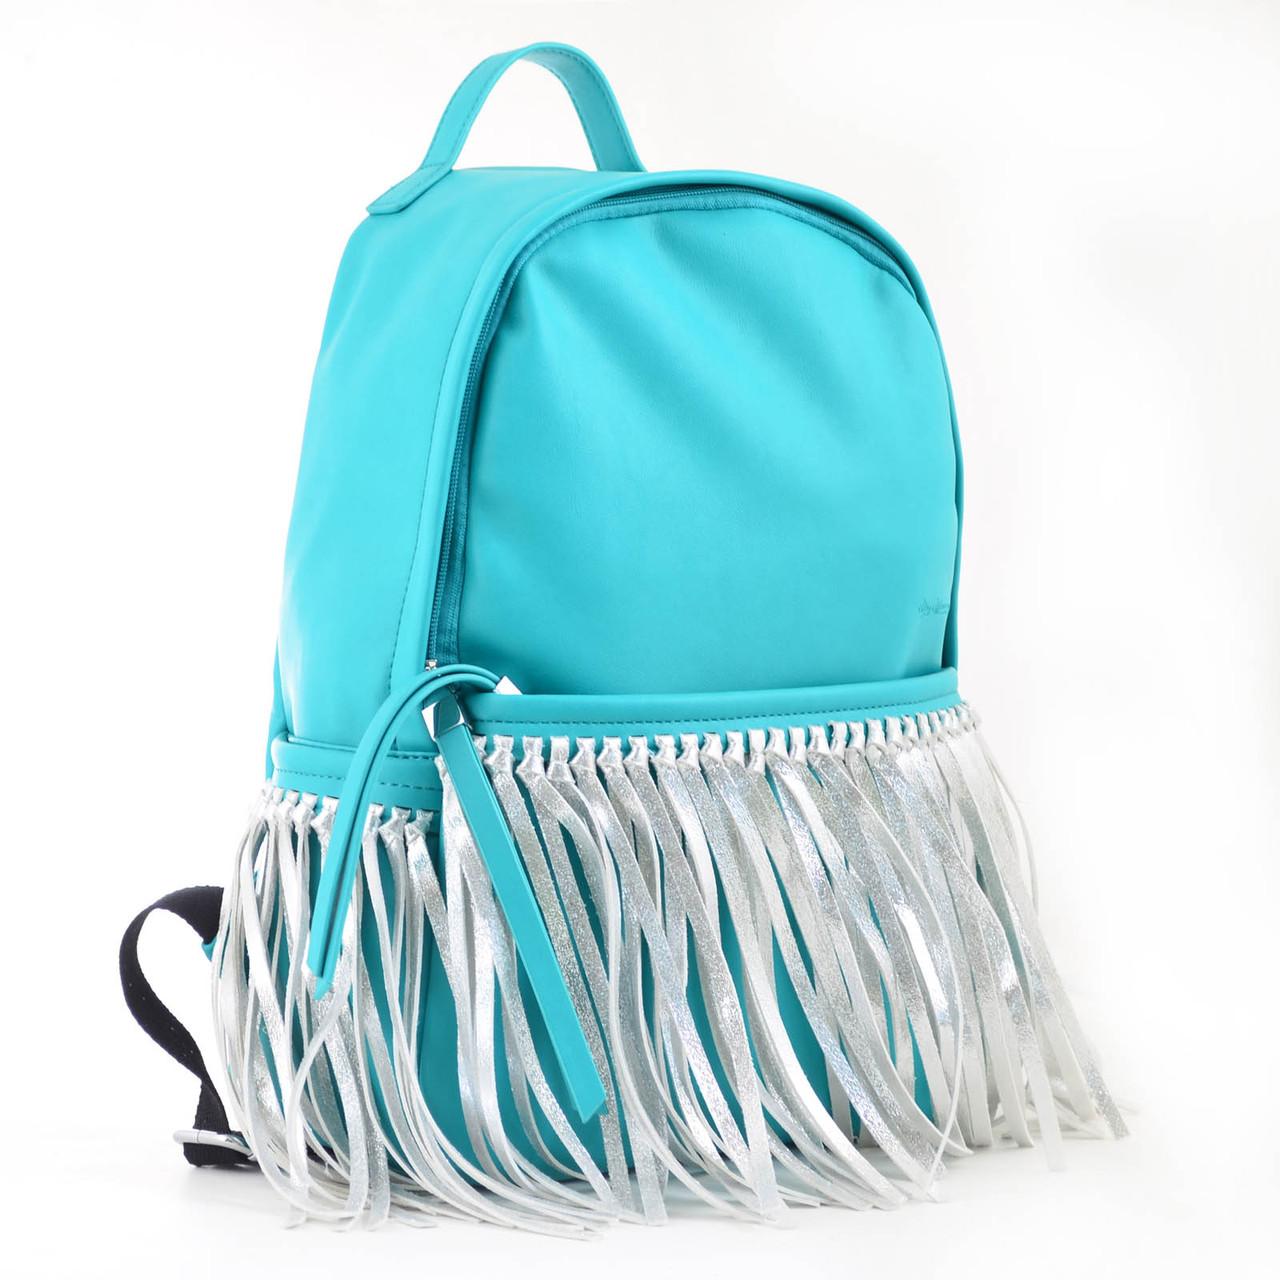 Сумка-рюкзак YES мятный с бахромой 36*26*11 код: 554197